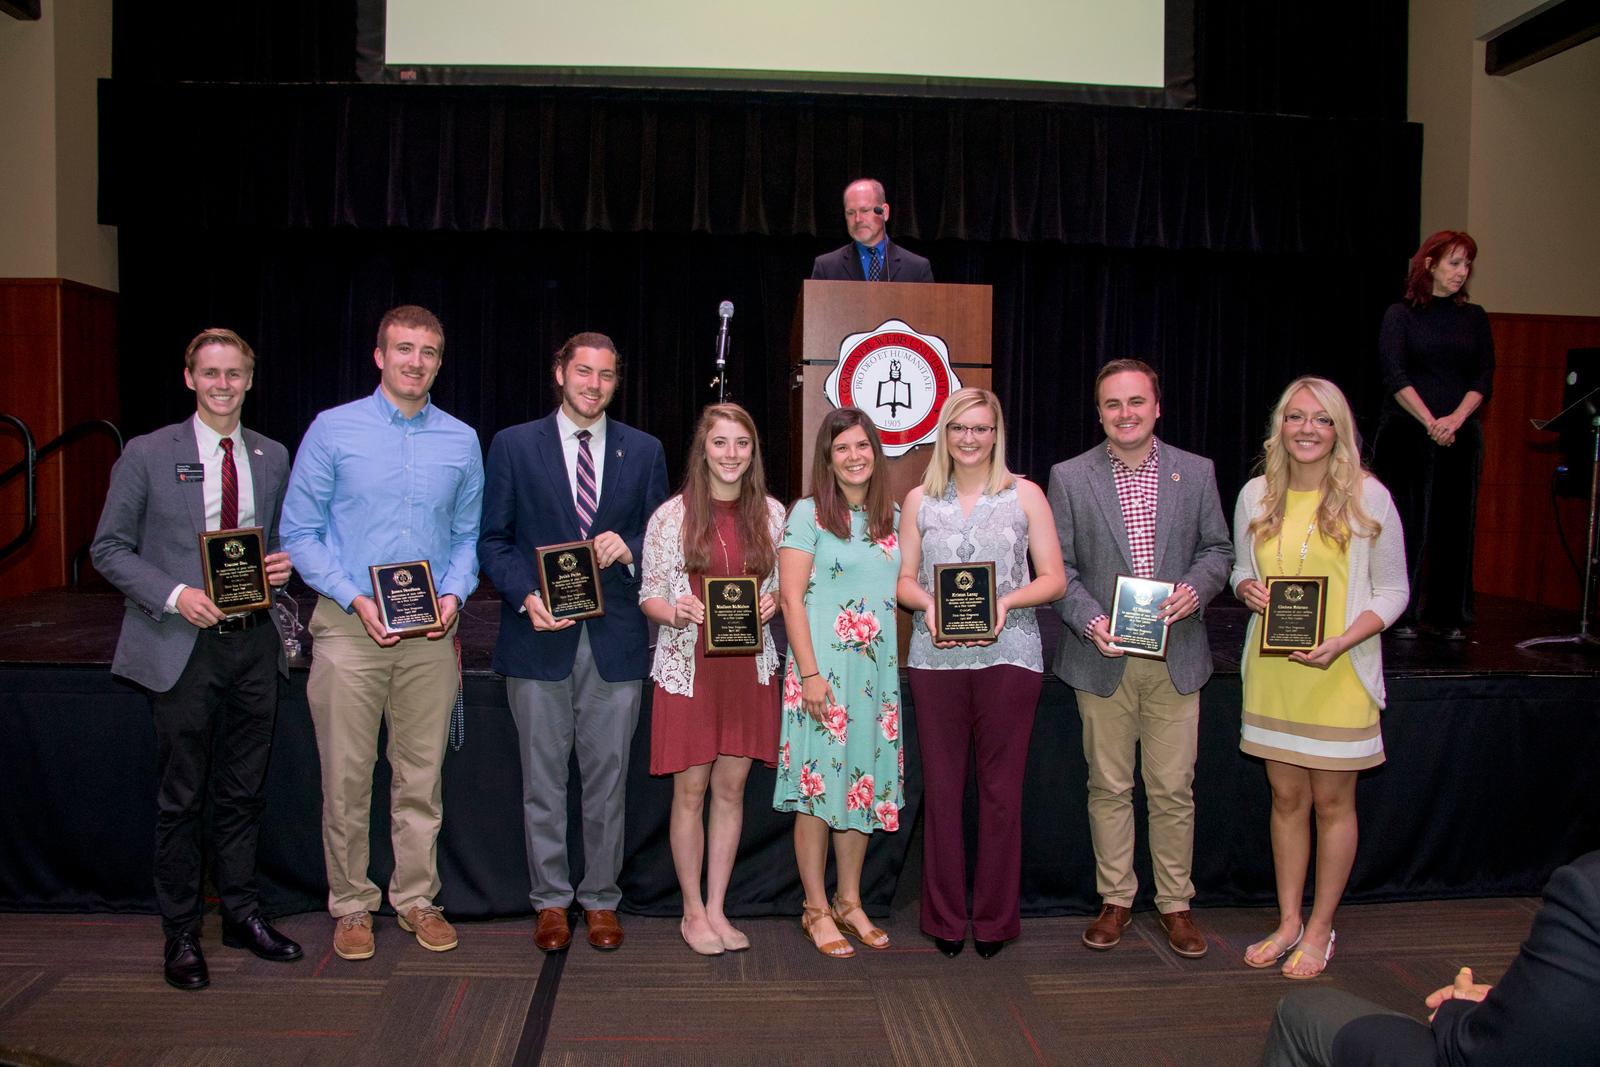 Student Leadership, Service and Volunteerism Recognition Program April 2017